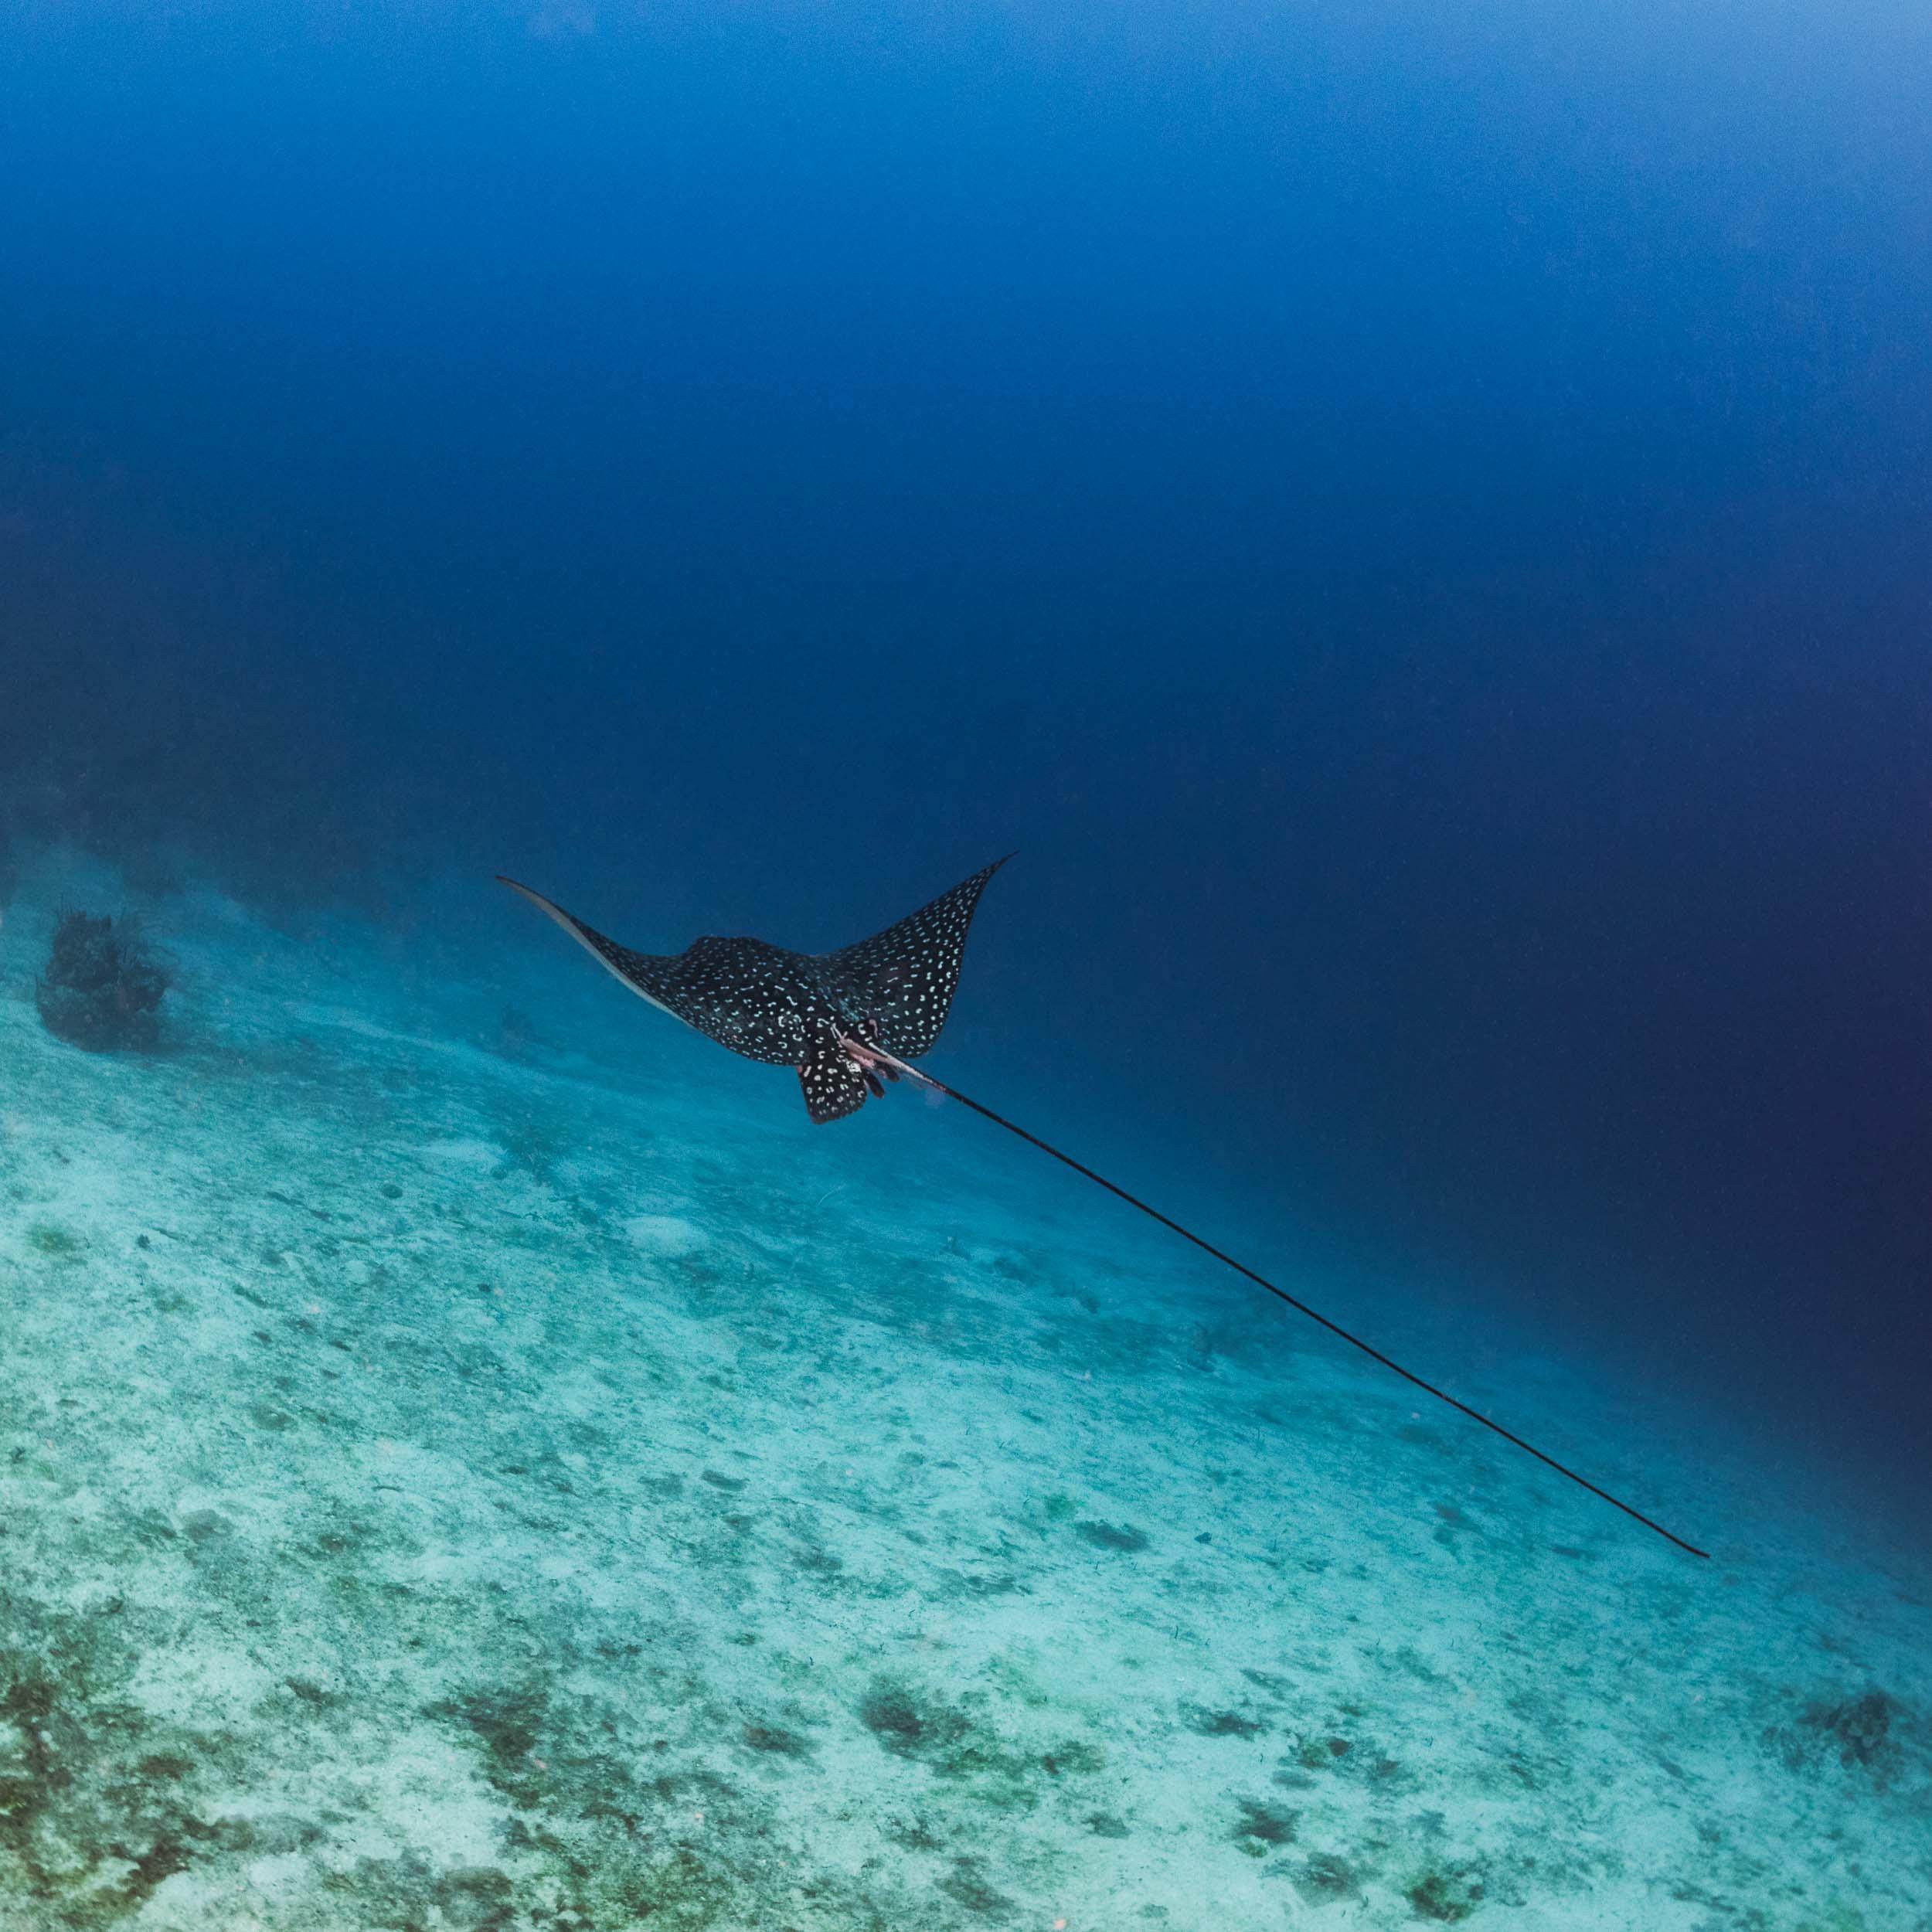 eagle-ray-utila-honduras-1.jpg